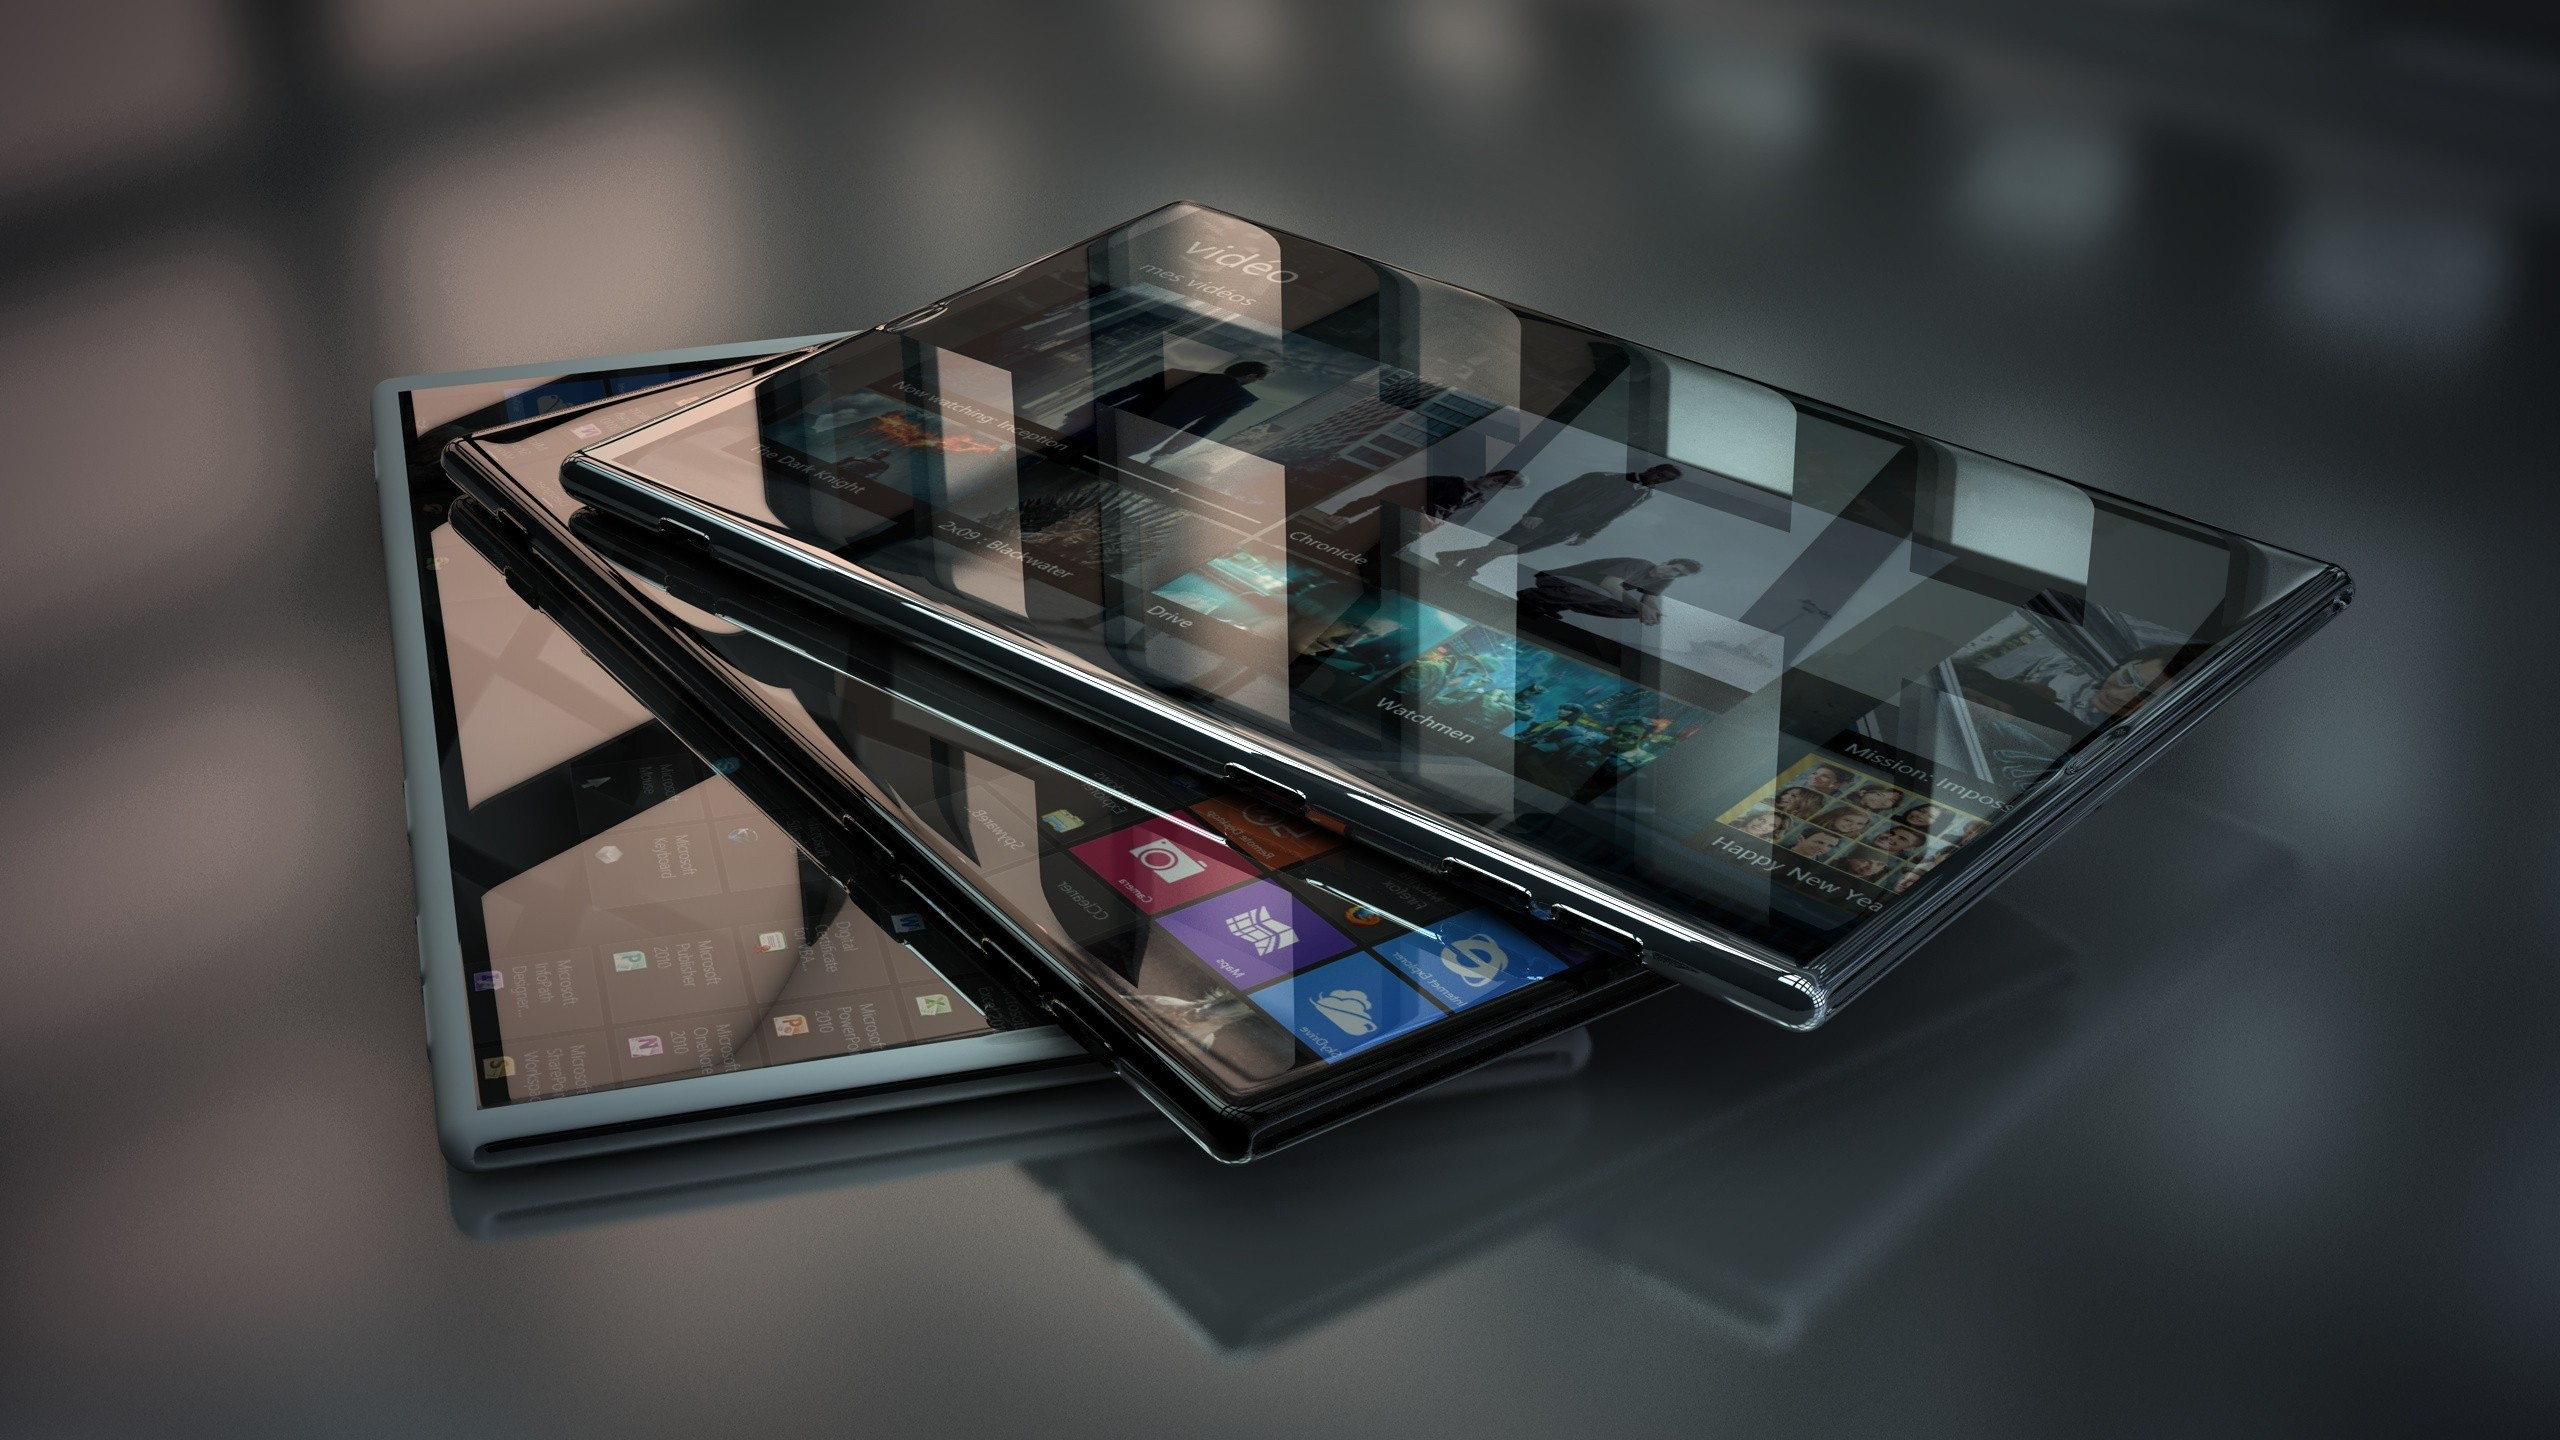 Concept Phones